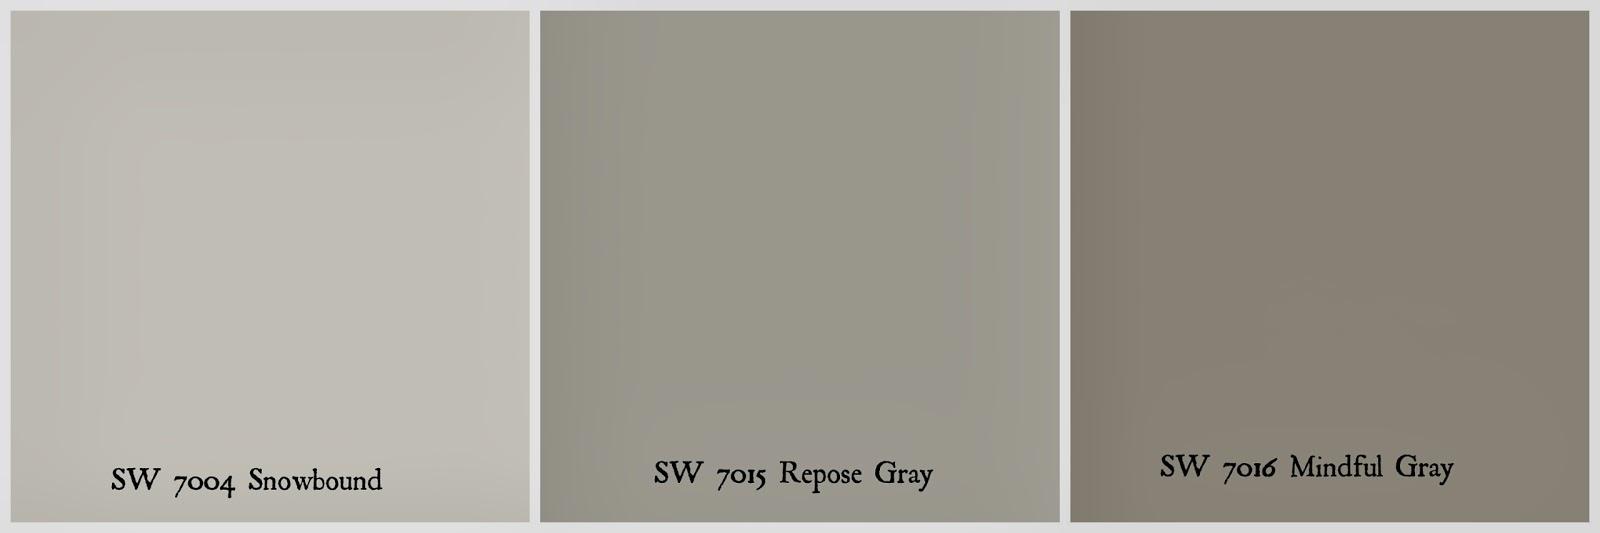 How to clean painted bathroom walls - Repose Gray Hueology Studio